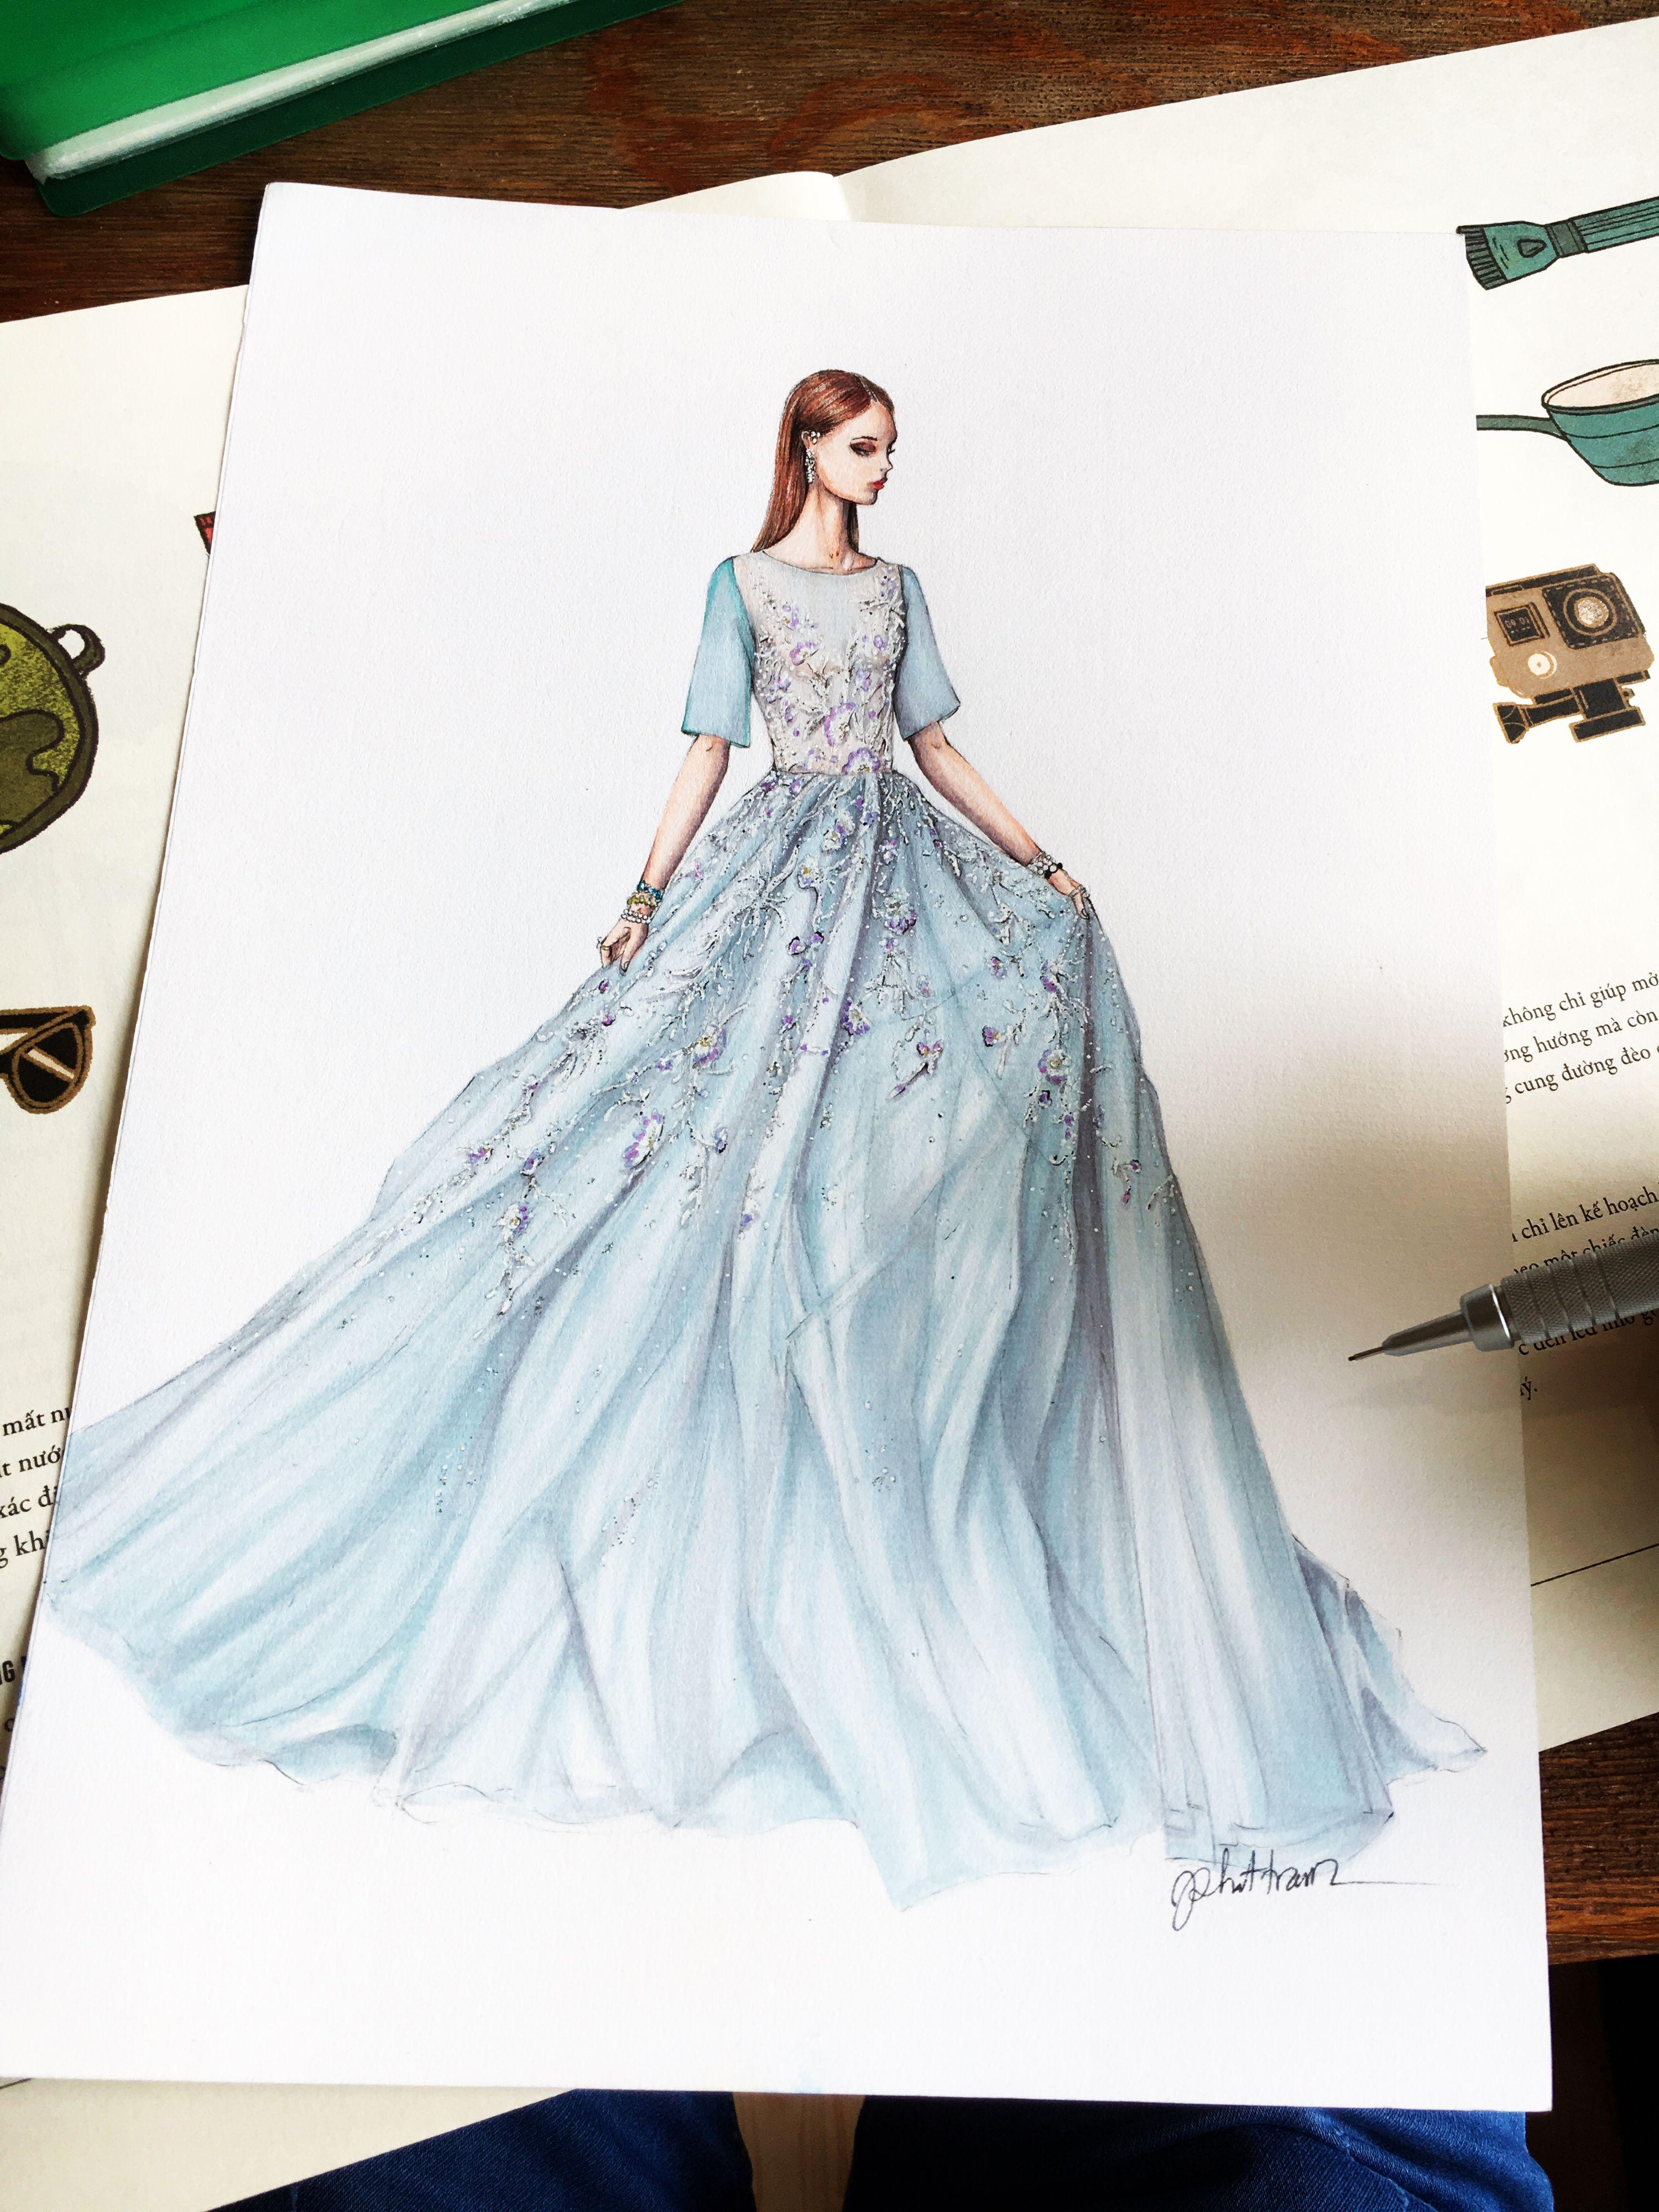 Sketch sketching draw drawing fashion fashionsketch